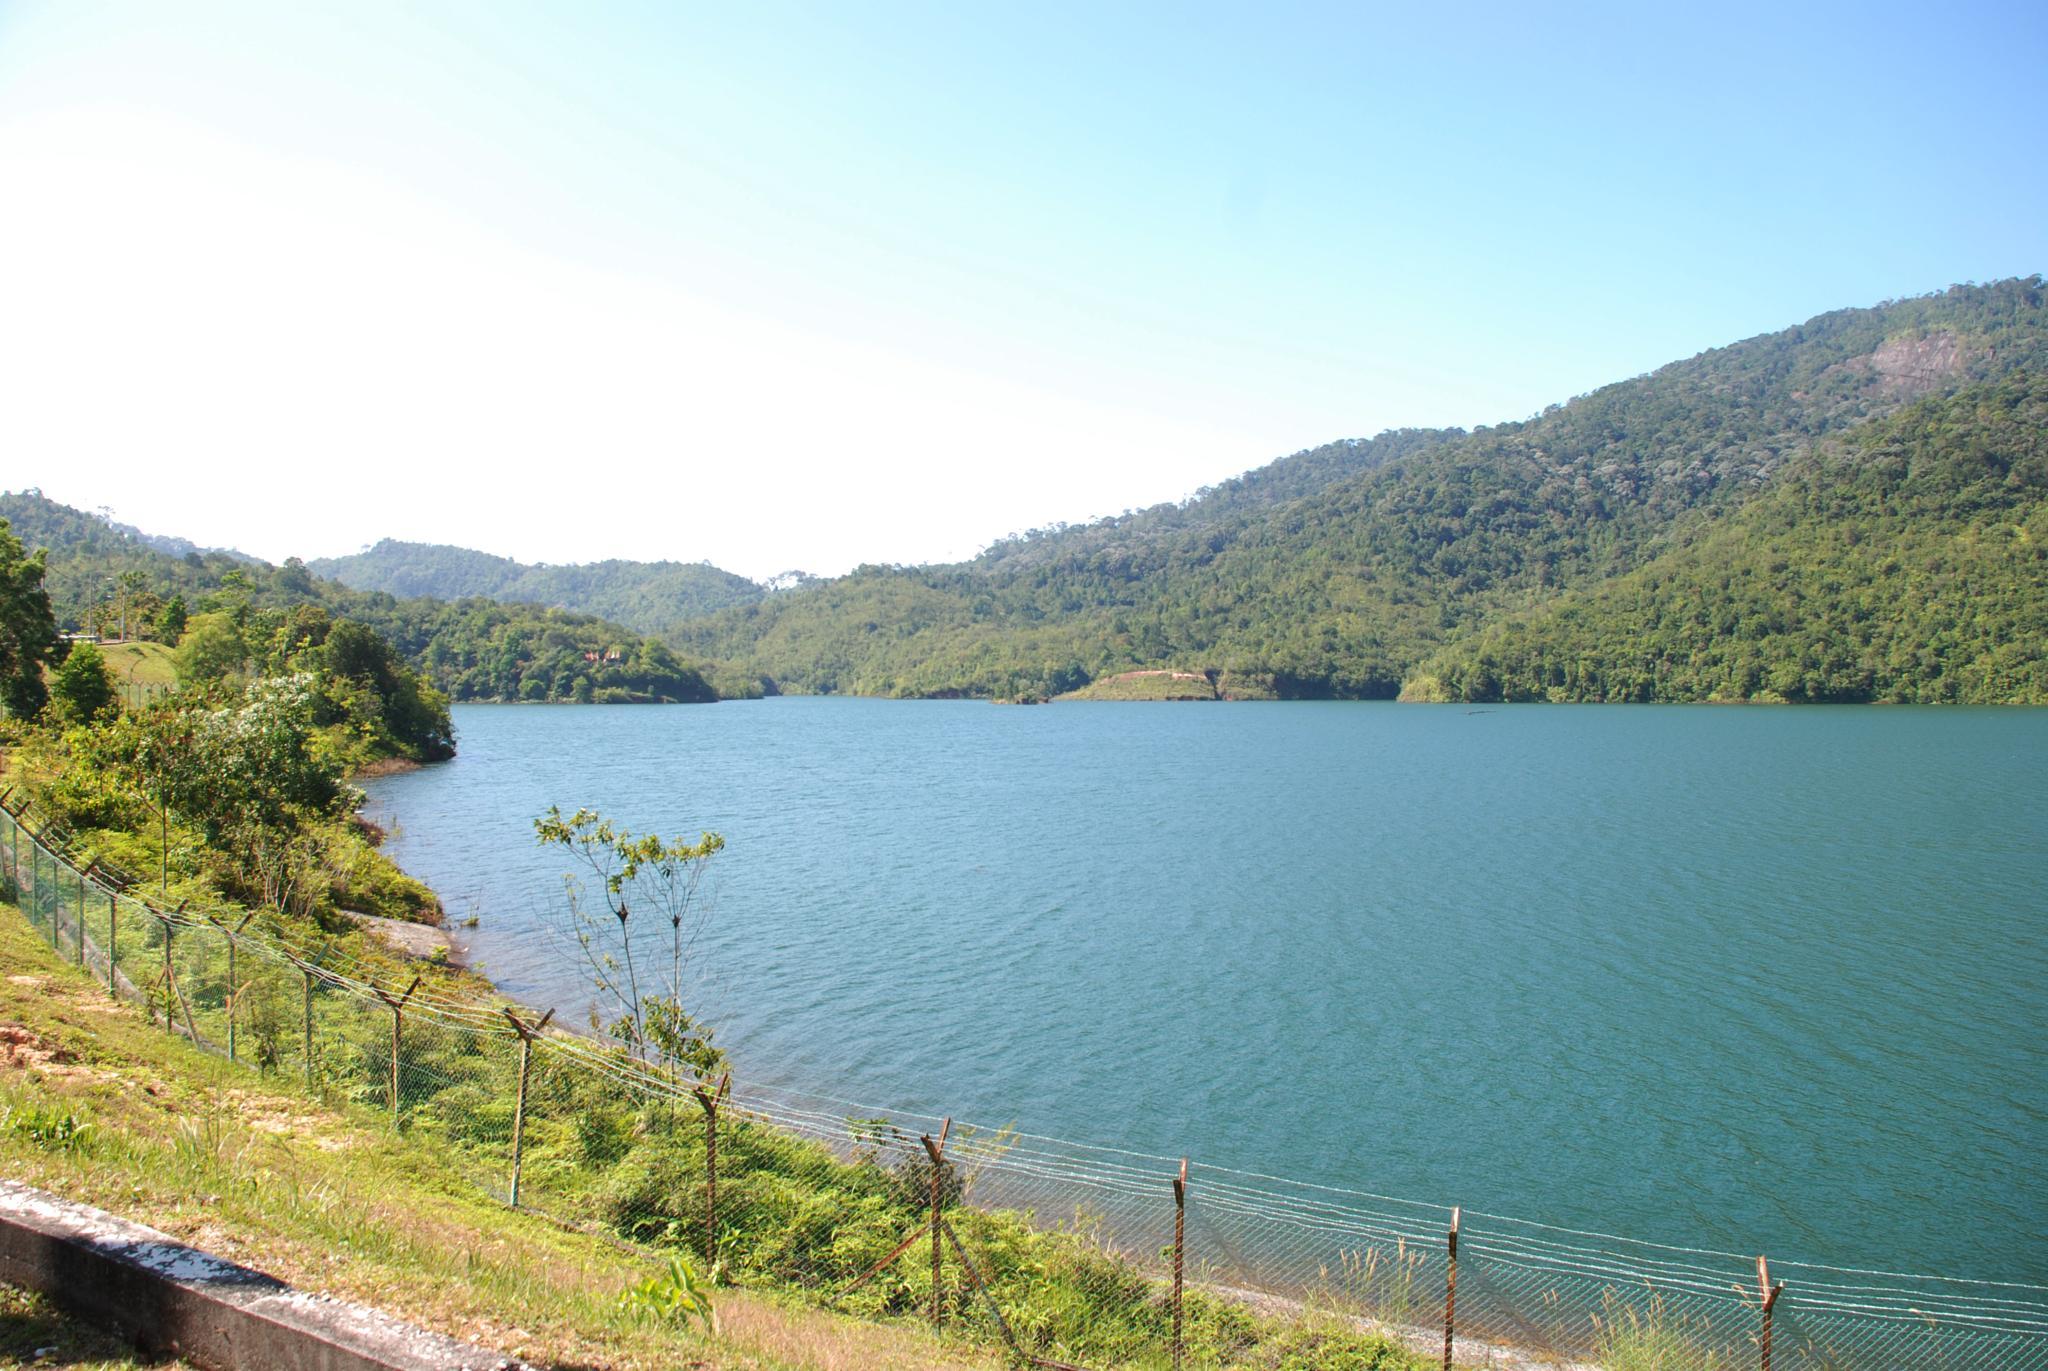 penang air itam dam by wooyuenfoo